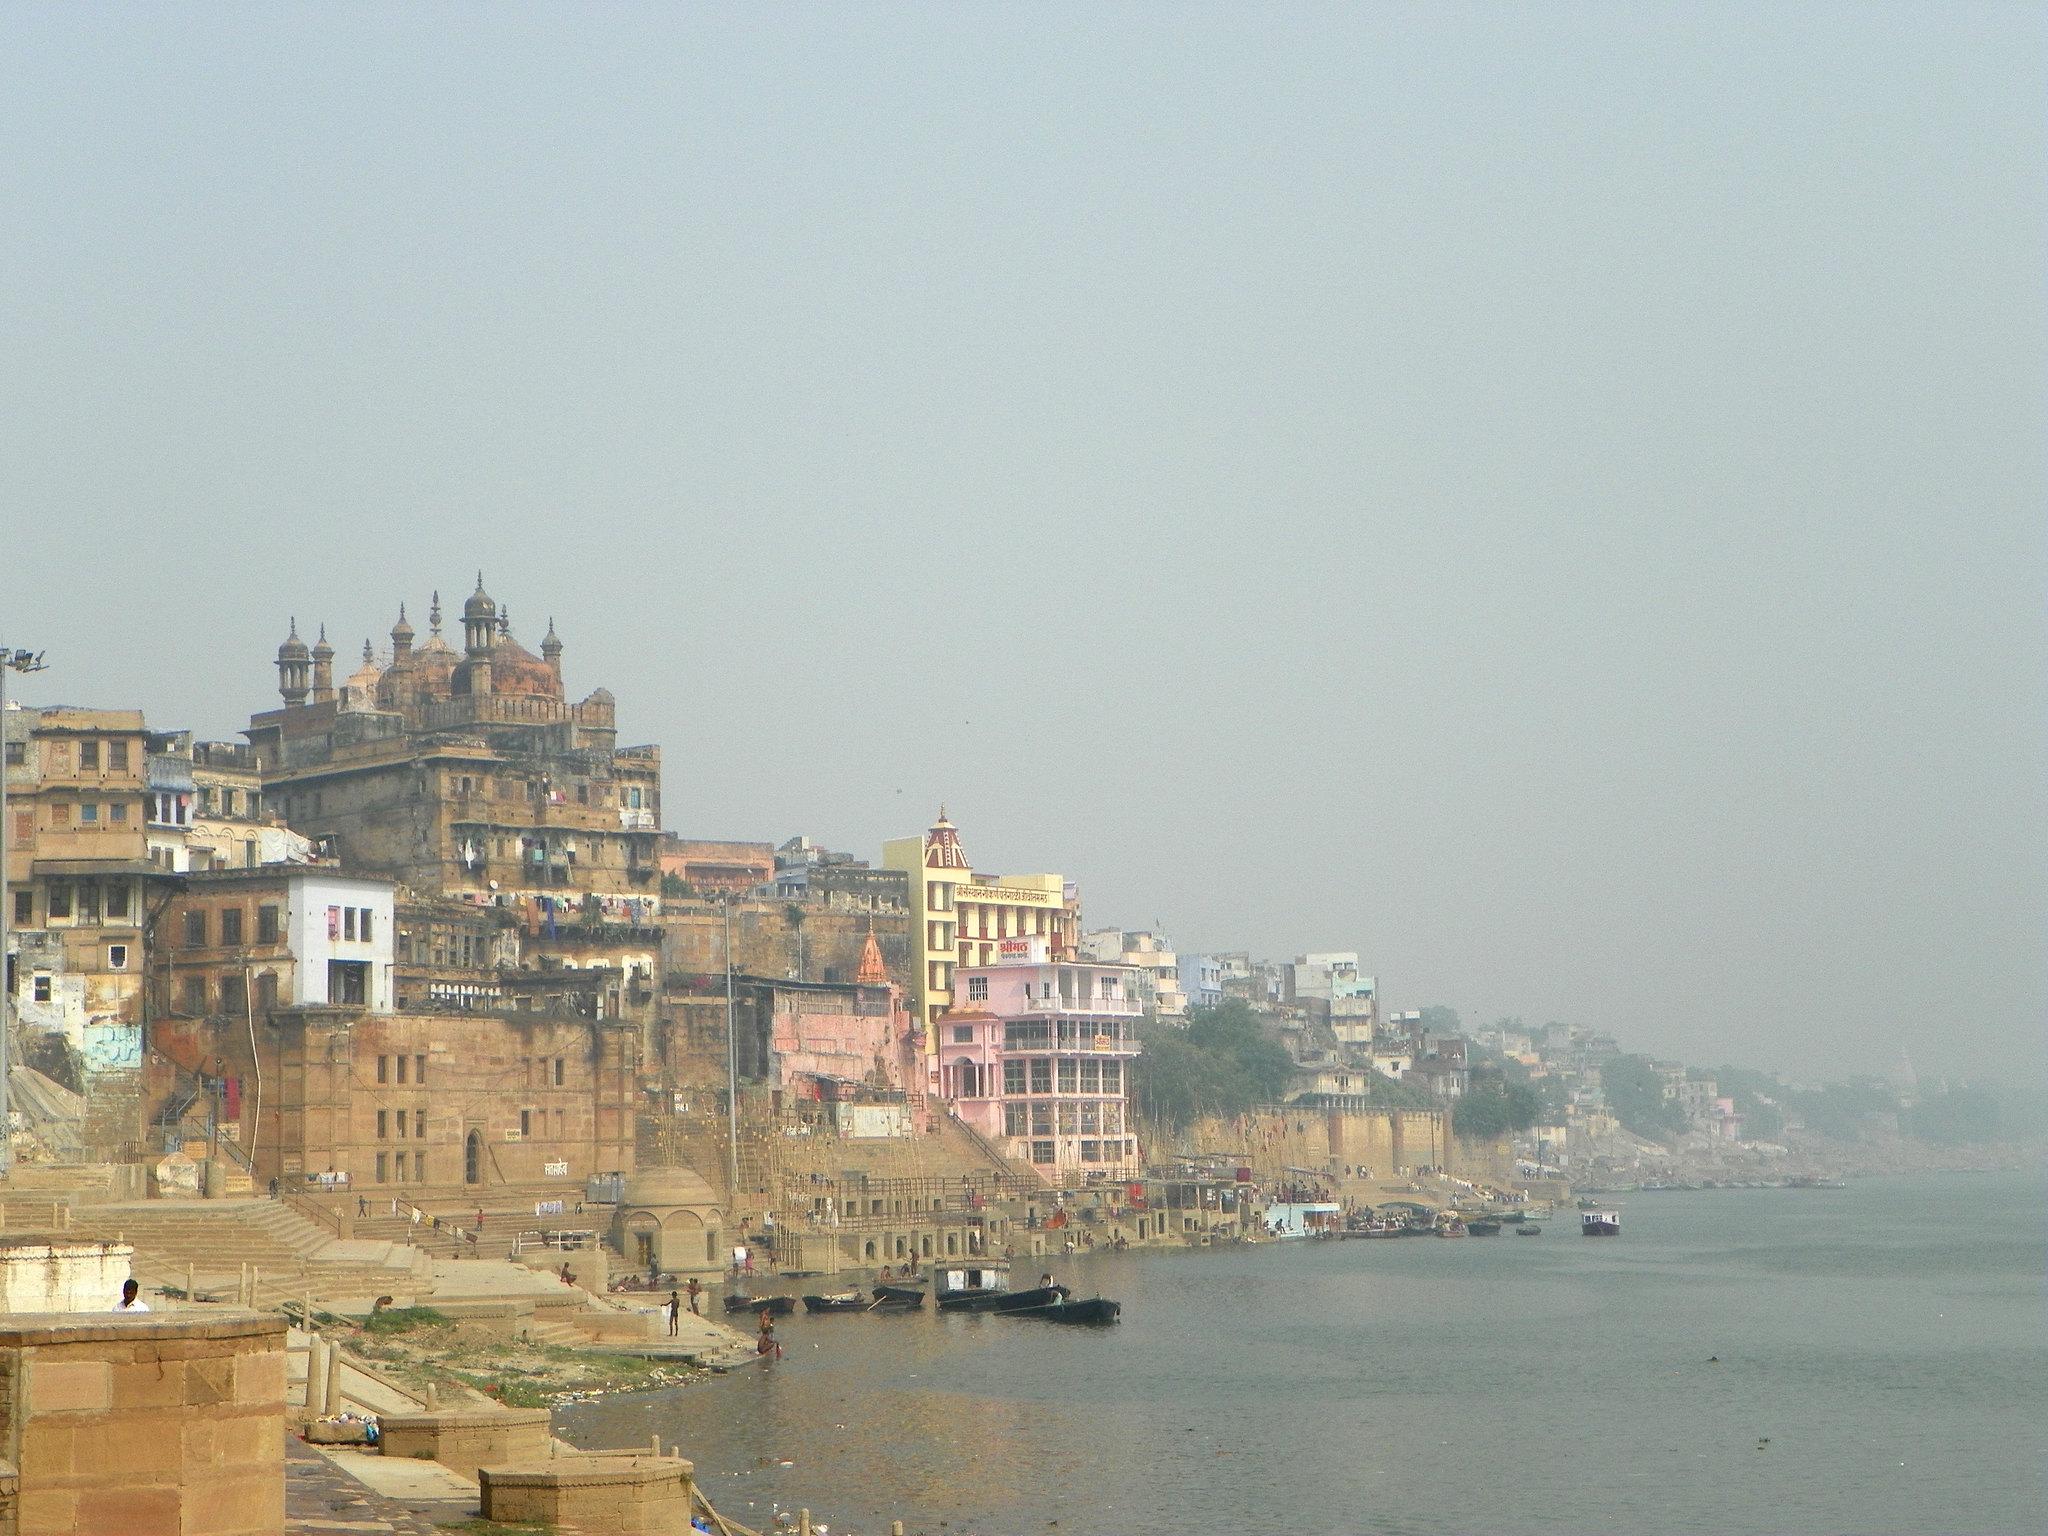 Top Tourist Place at Kashi Vishwanath Temple-The Banks of River Ganga